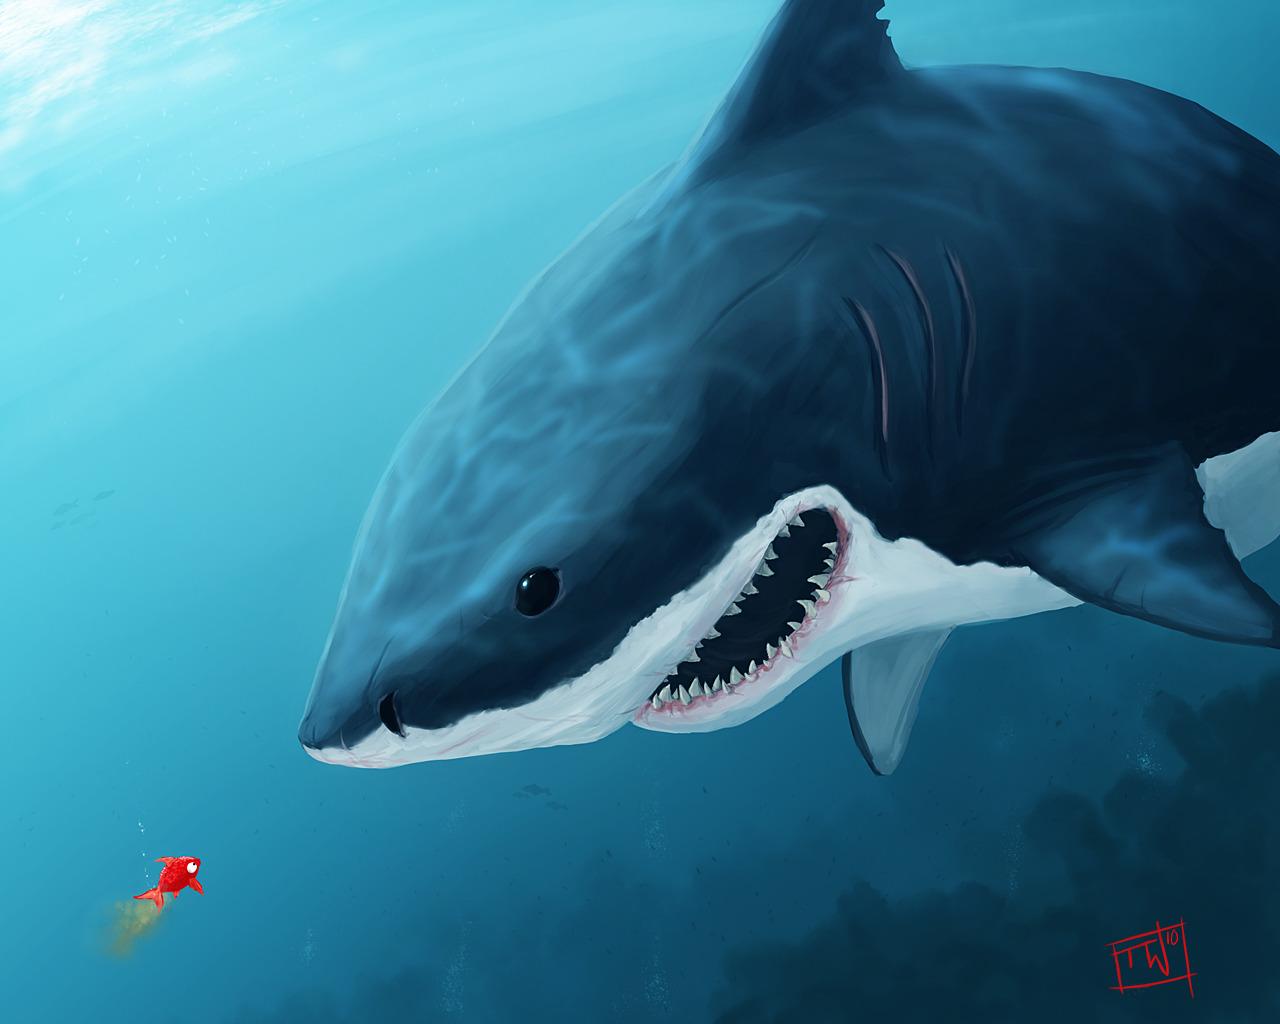 Art shark fish wallpaper 1280x1024 8986 for How to shark fish